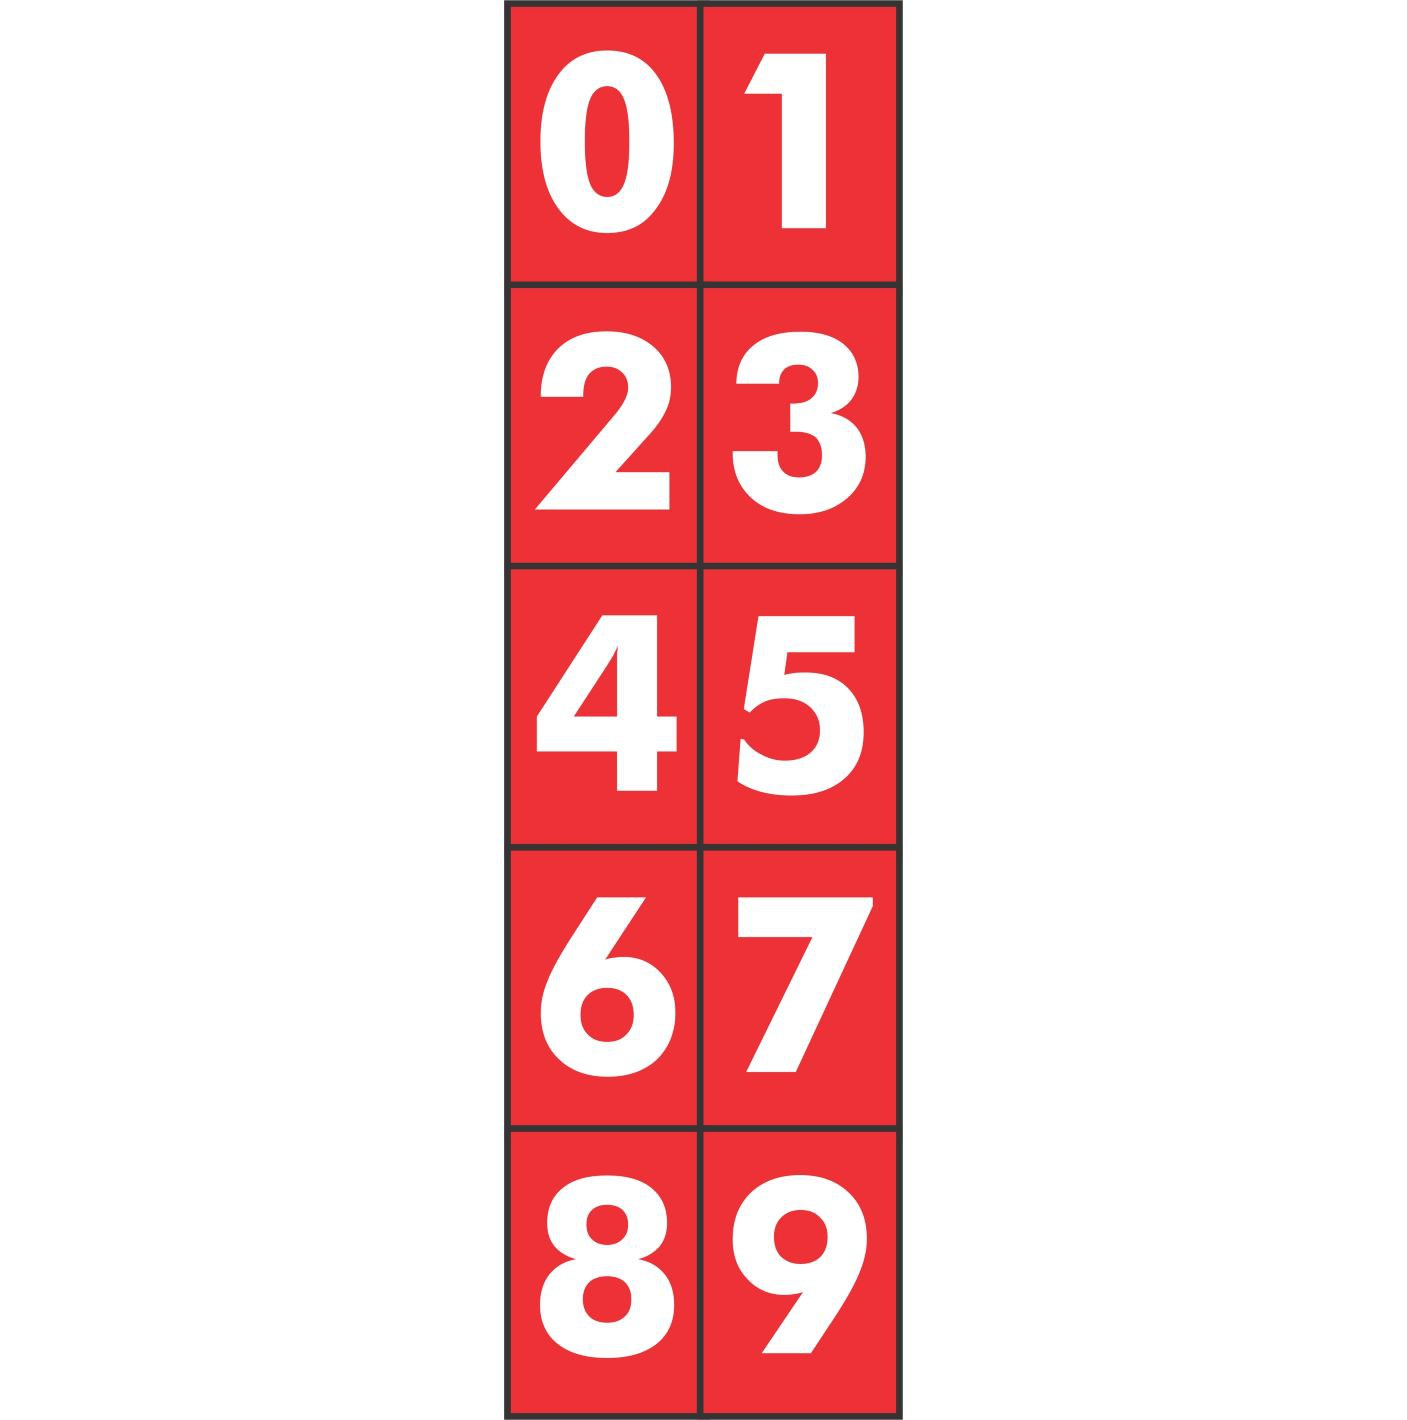 Placa Números CIPA PS803 (14,5x12,5cm)